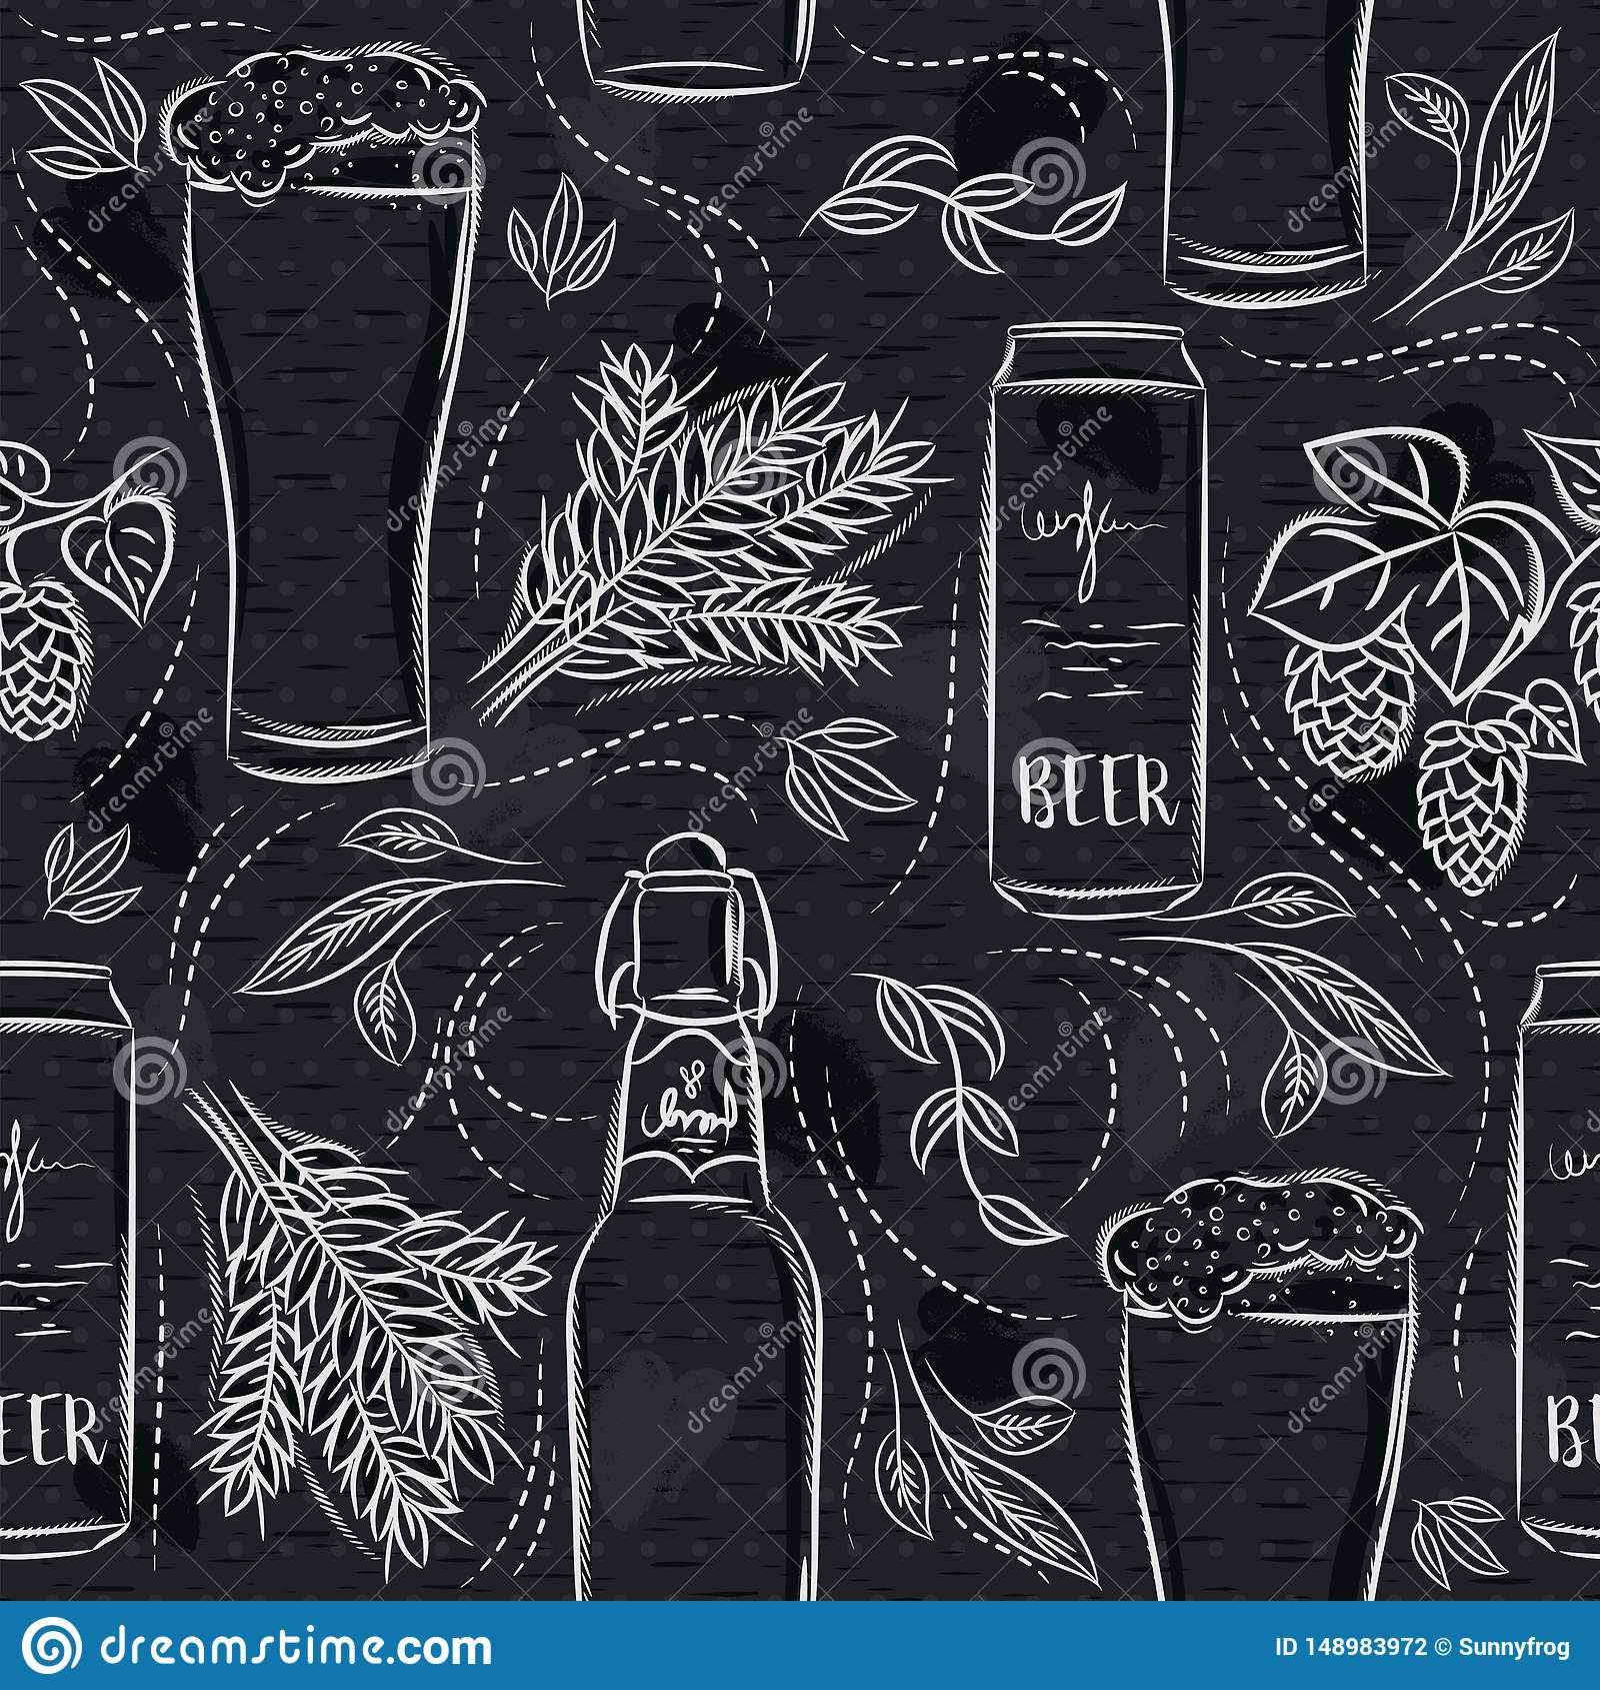 Seamless Patterns With Set Of Beer Bottle, Mug, Barley And Hop On